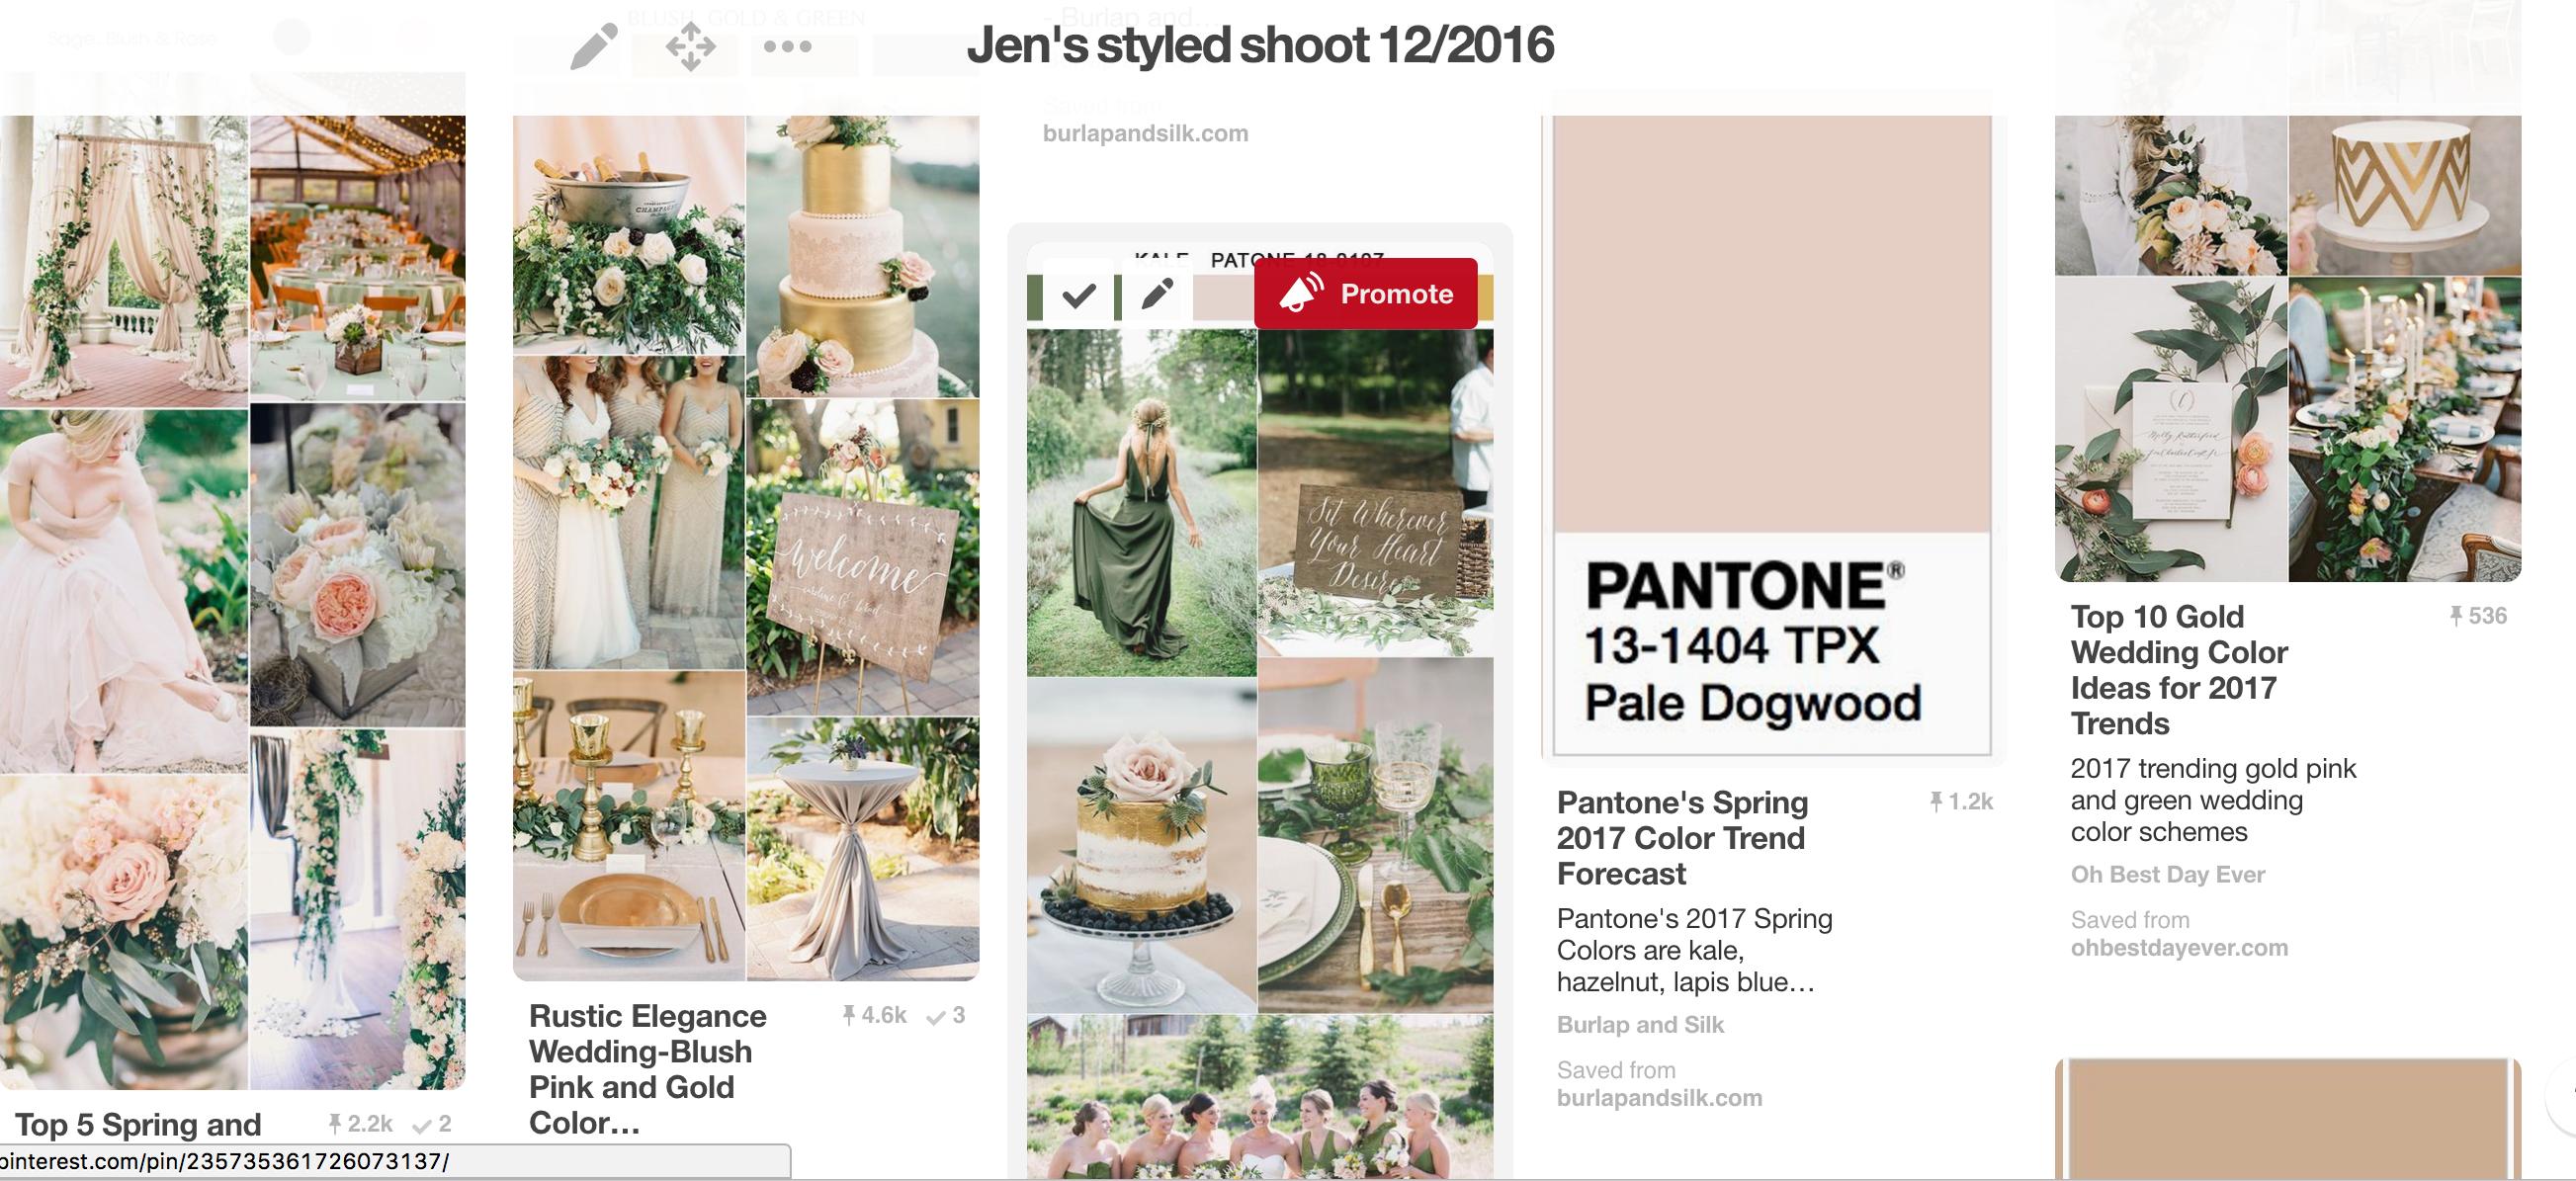 Pantone Greenery Wedding Styled Shoot Mood Board